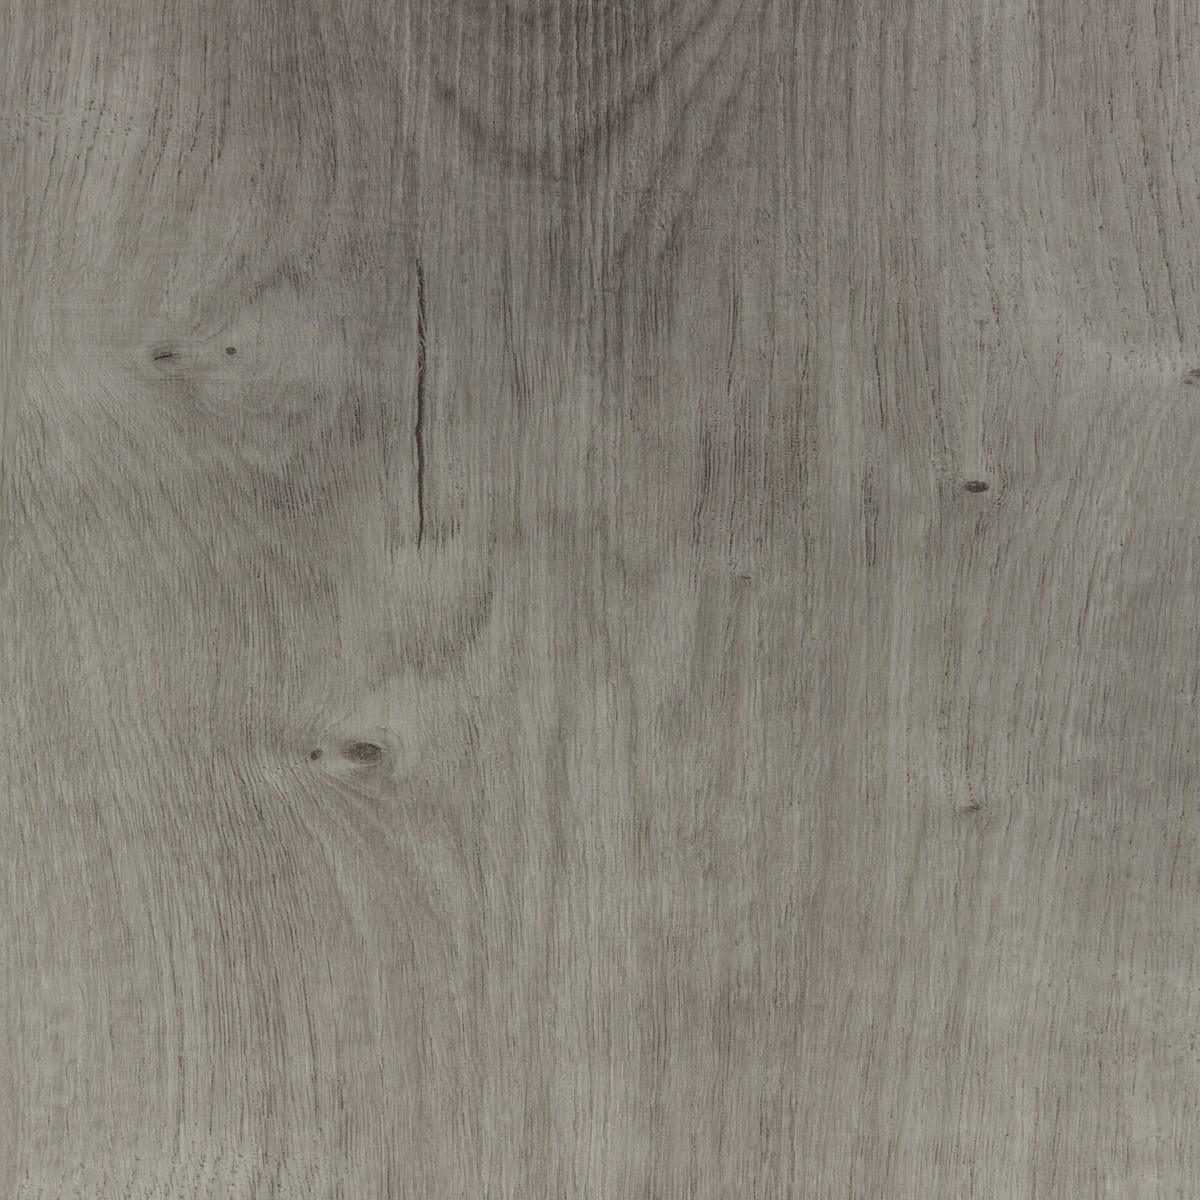 ECOCLICK 55 - Forest Oak Light Grey